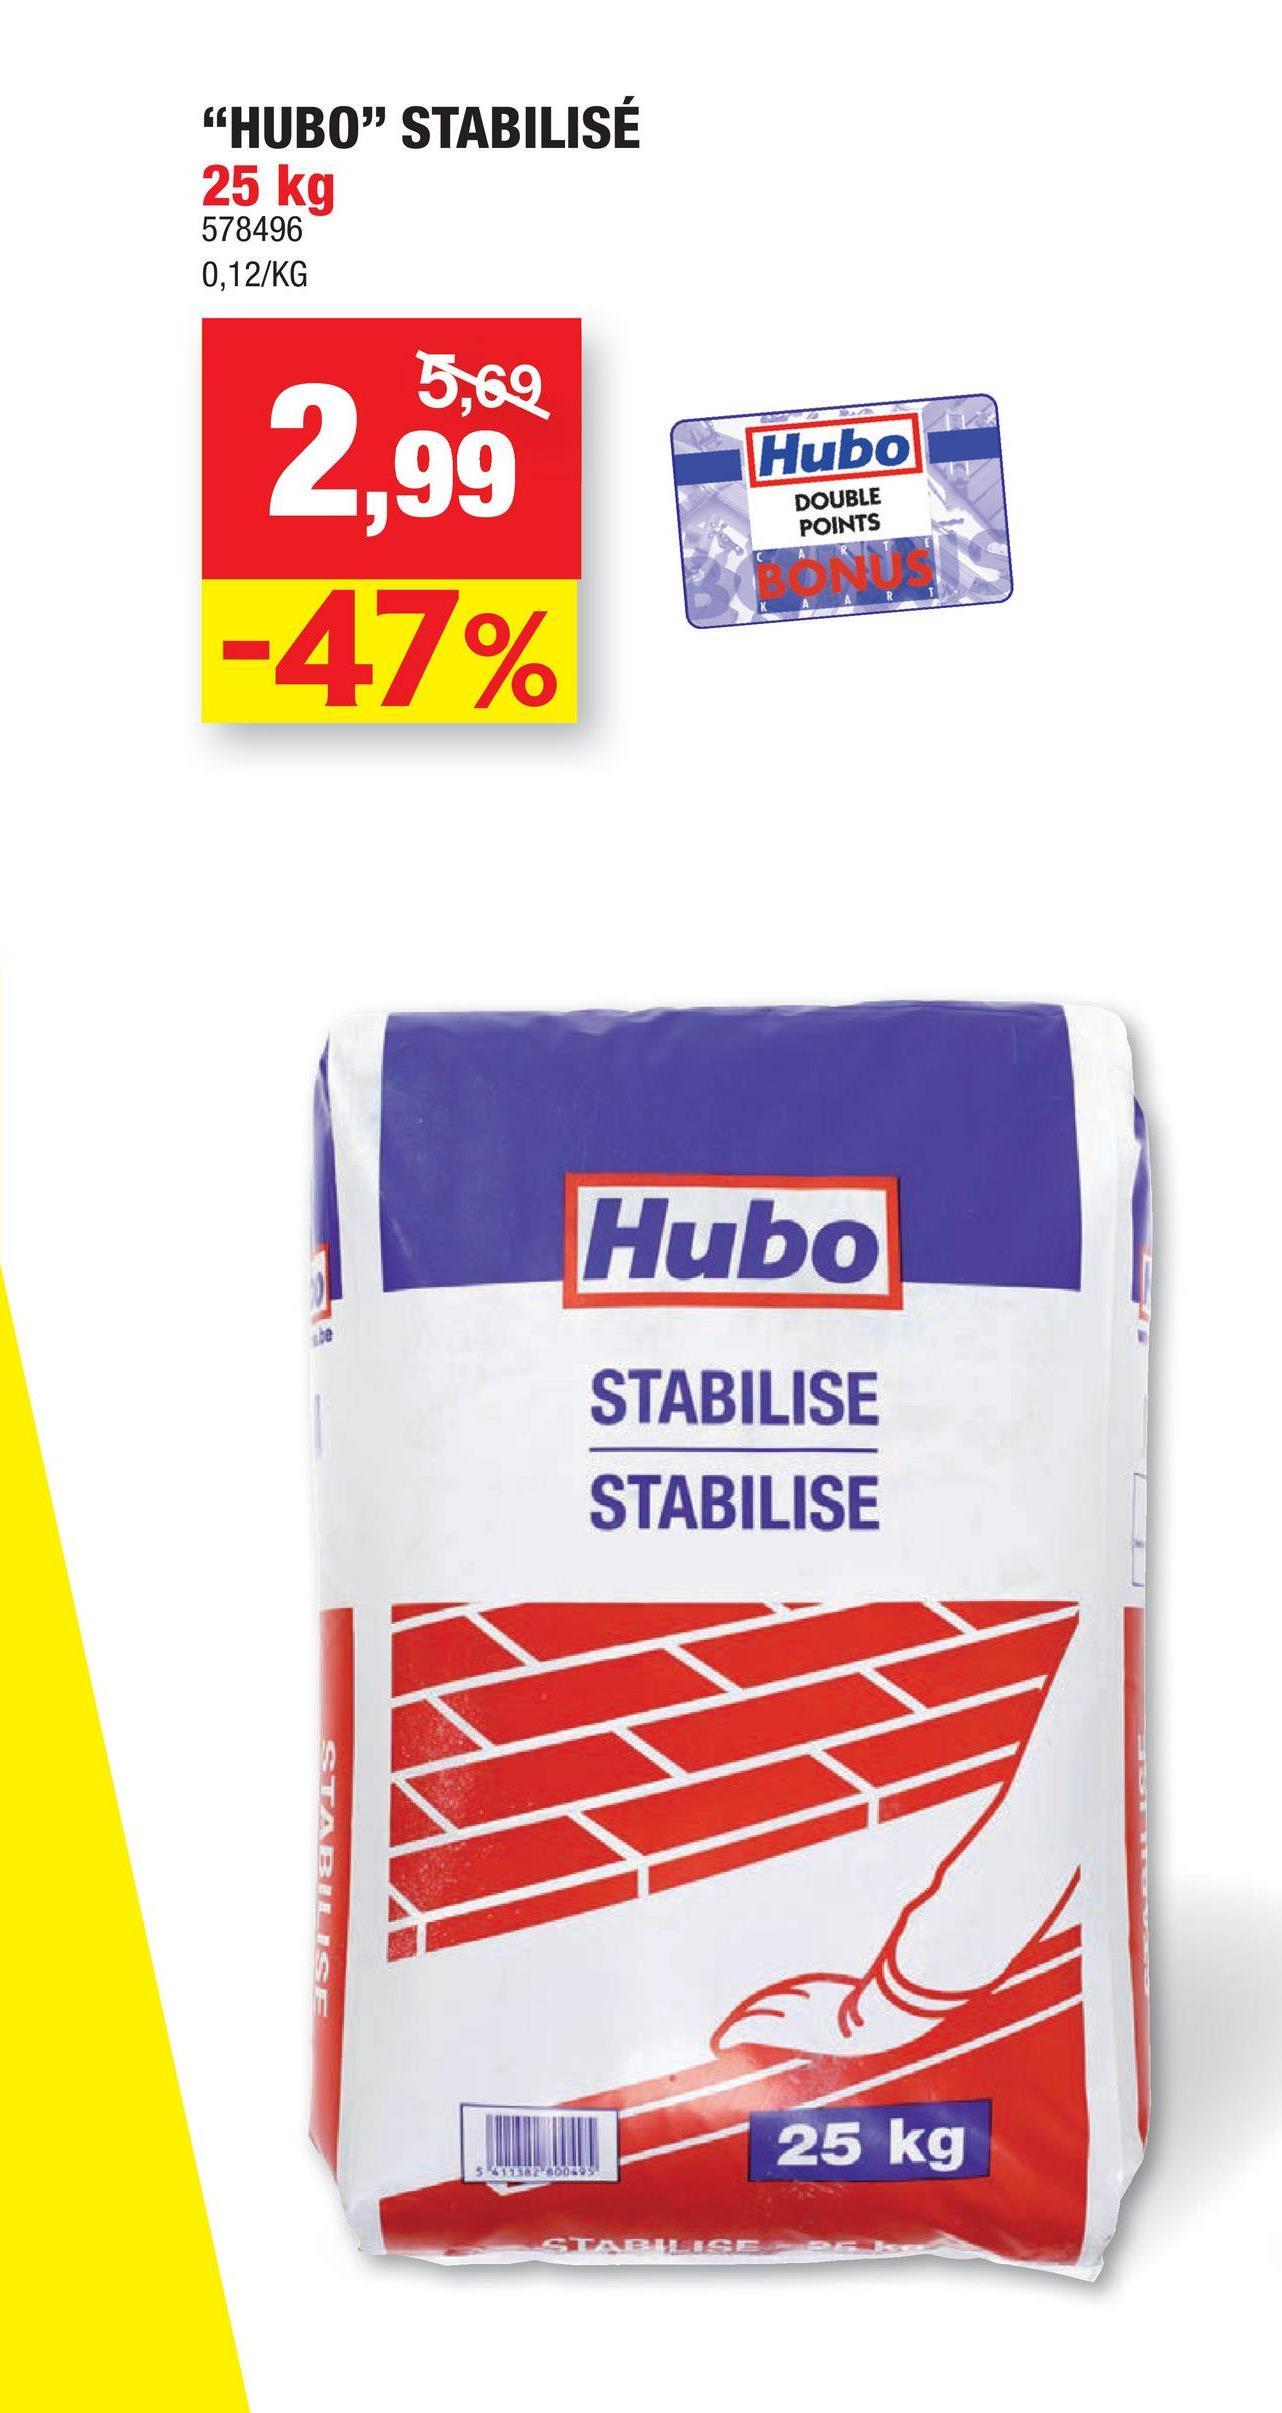 """HUBO"" STABILISÉ 25 kg 578496 0,12/KG 5,69 Hubo 2,99 -47% DOUBLE POINTS Hubo STABILISE STABILISE STABILISE 25 kg 5-6110095"